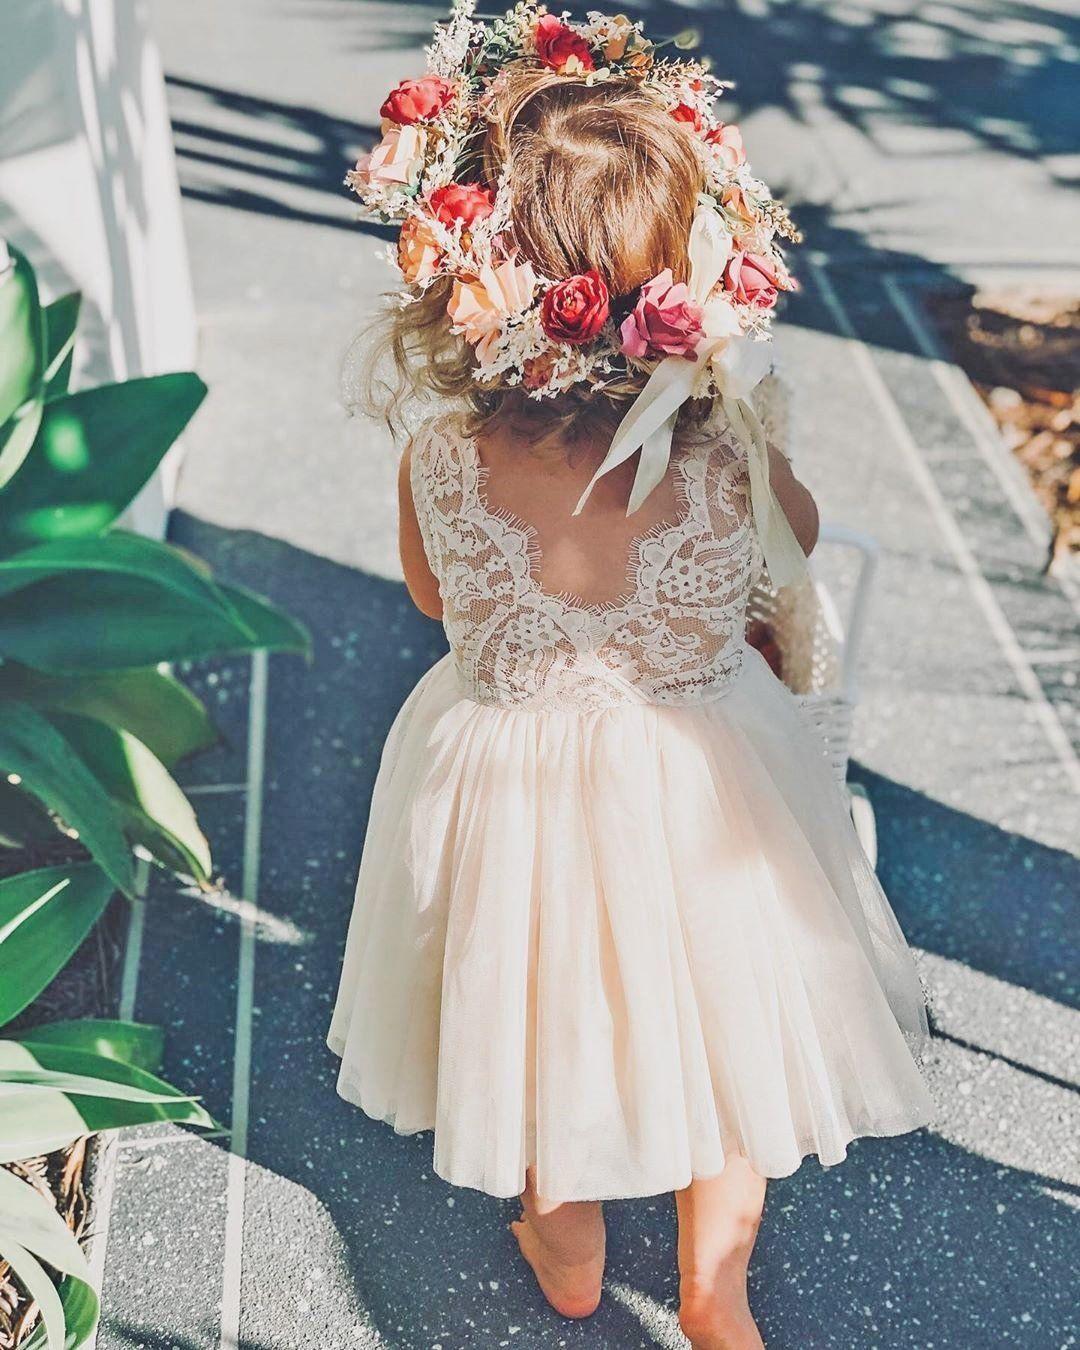 21 Flower Girl Dresses To Create A Magic Look %%sep%% %%sitename%%